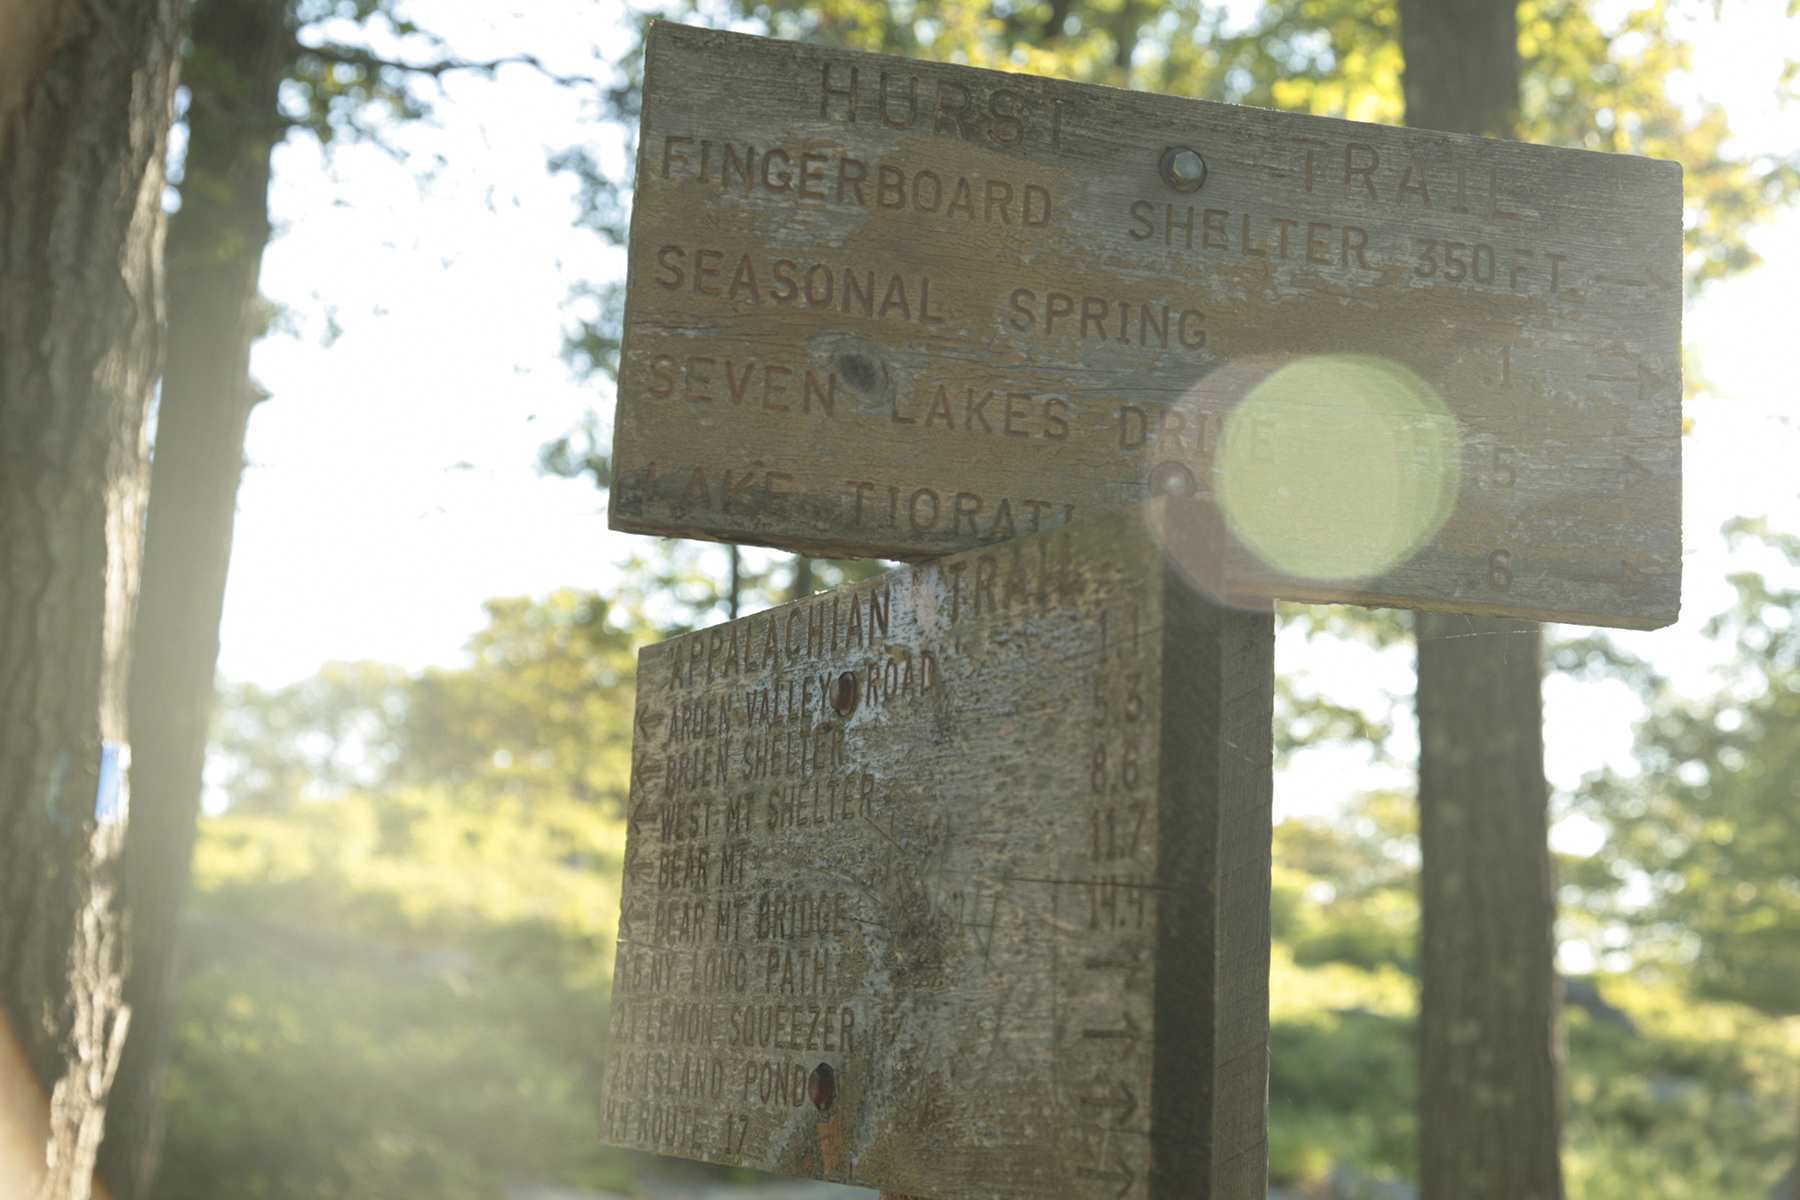 PUBLIC TRANSIT SERIES #5 - Harriman State Park, Southfields, New York